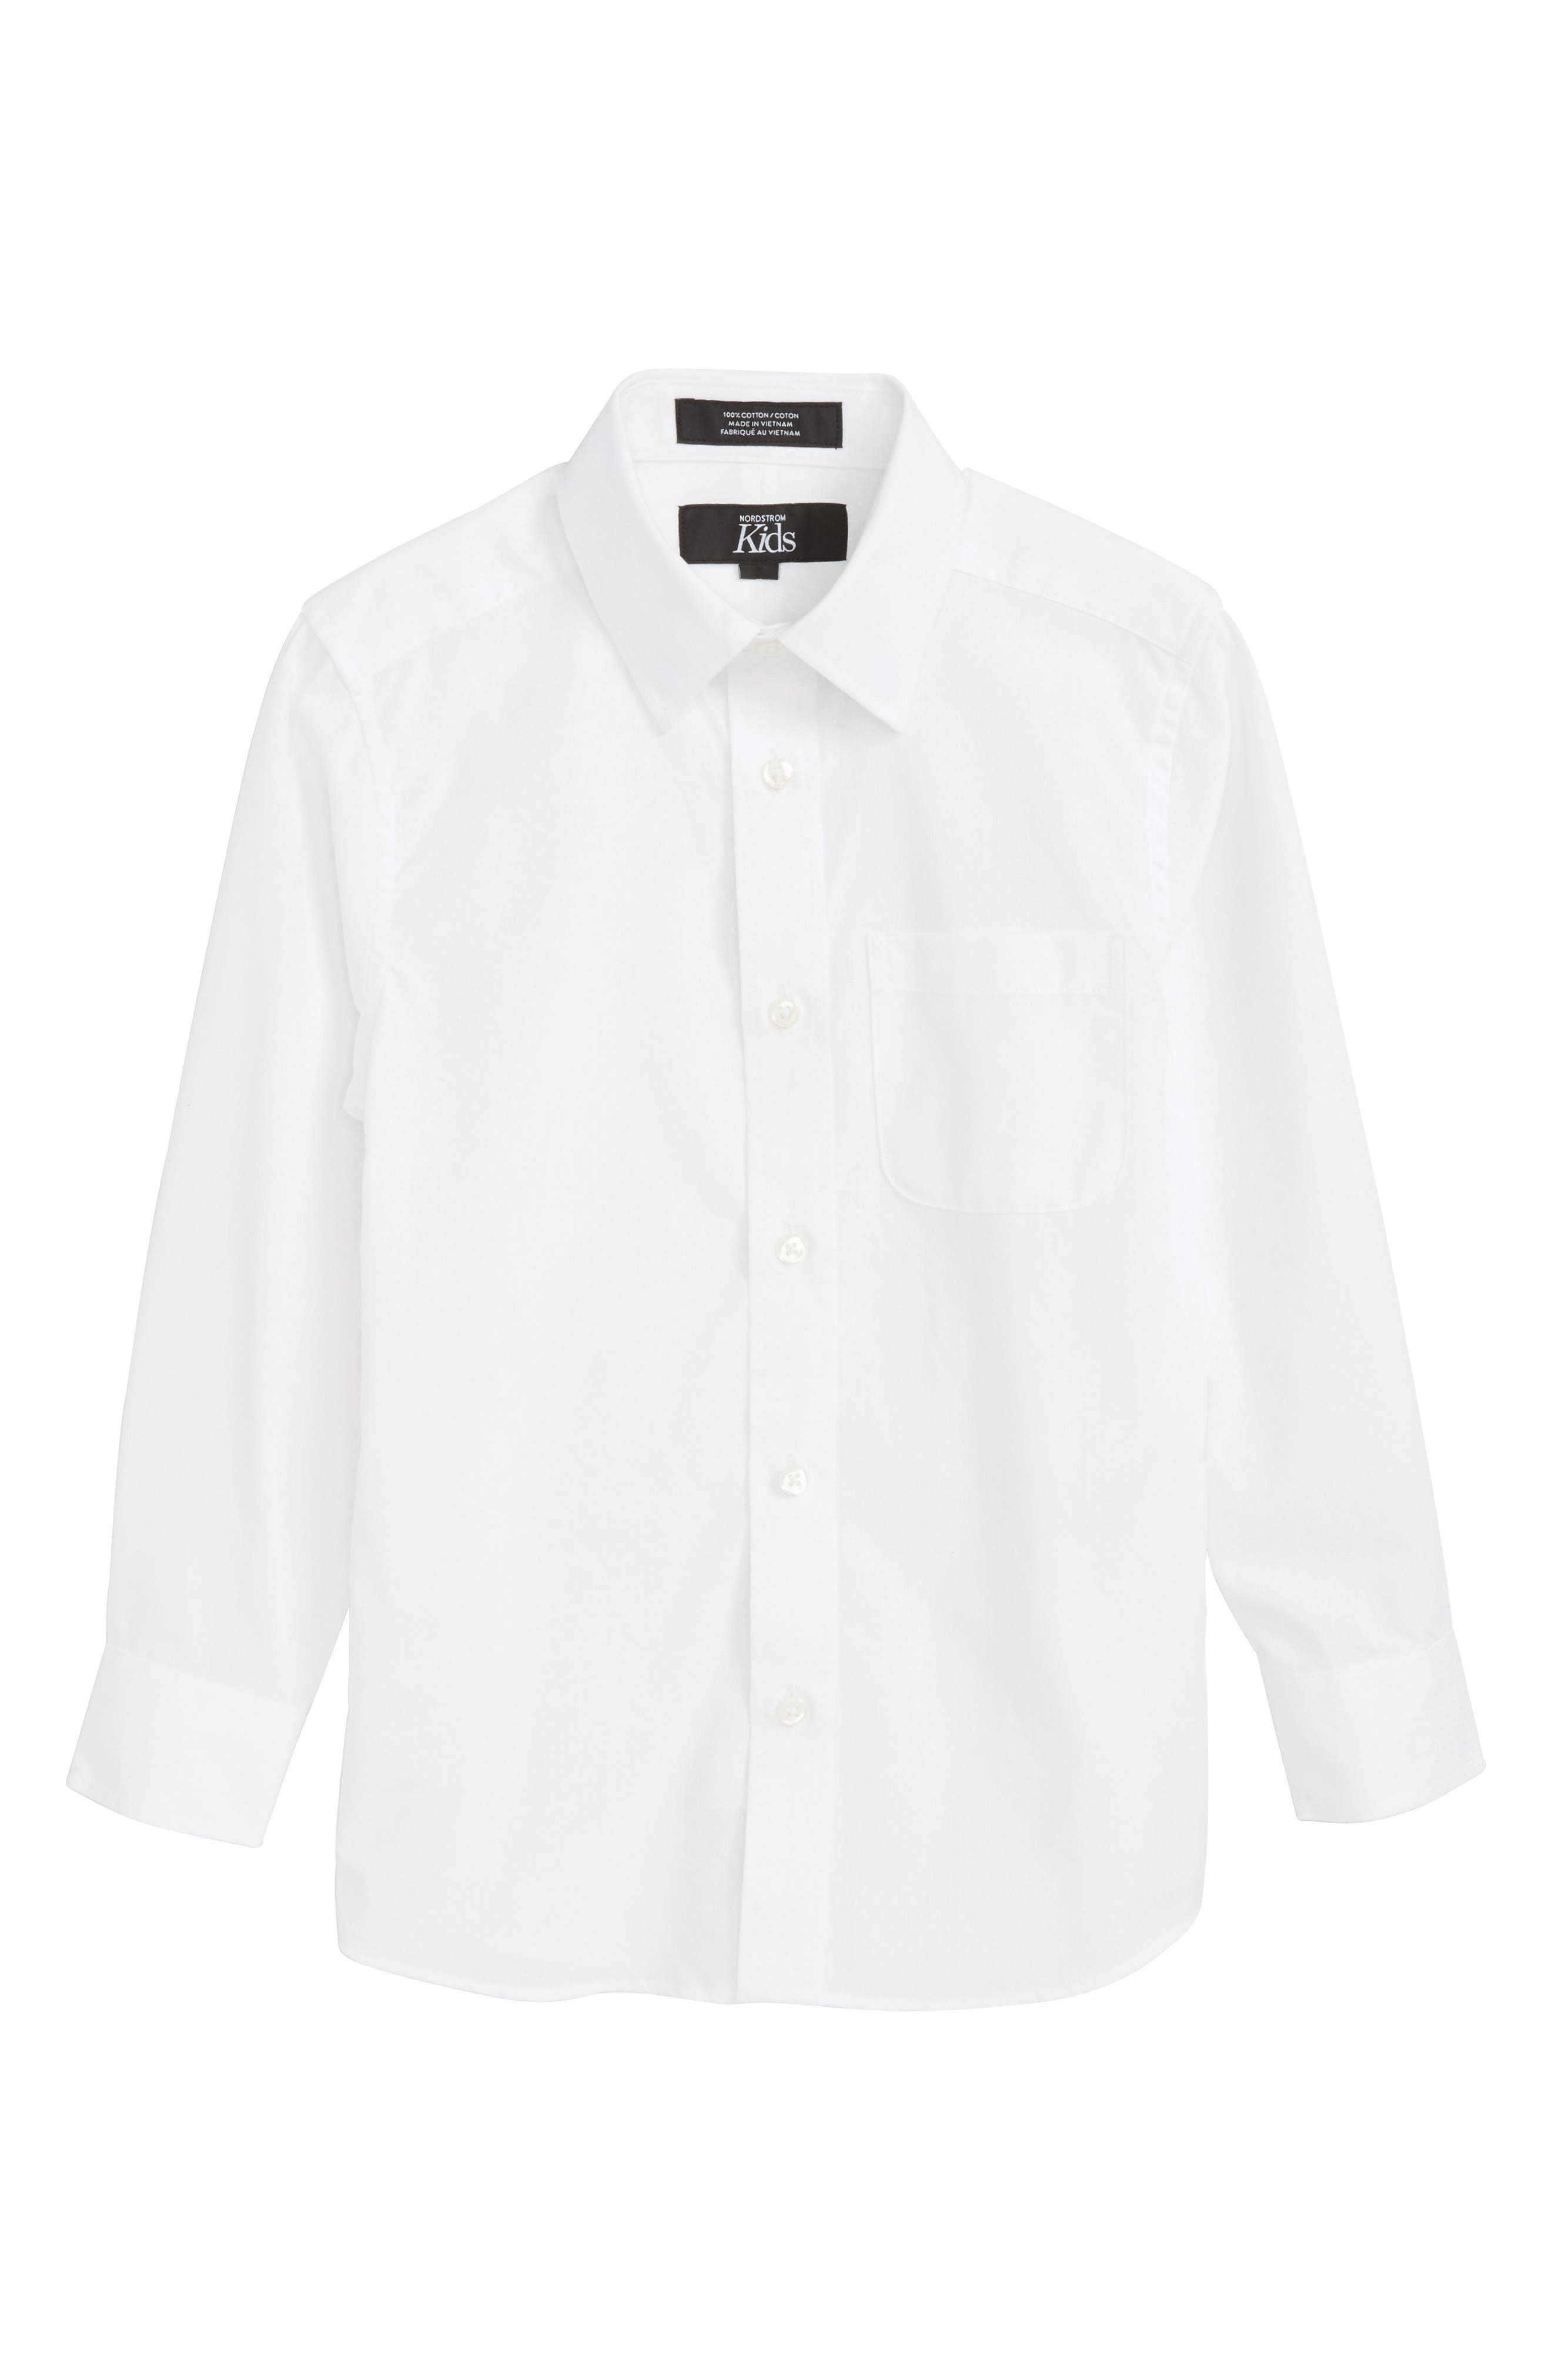 White Dobby Sport Shirt,                         Main,                         color, White Dobby